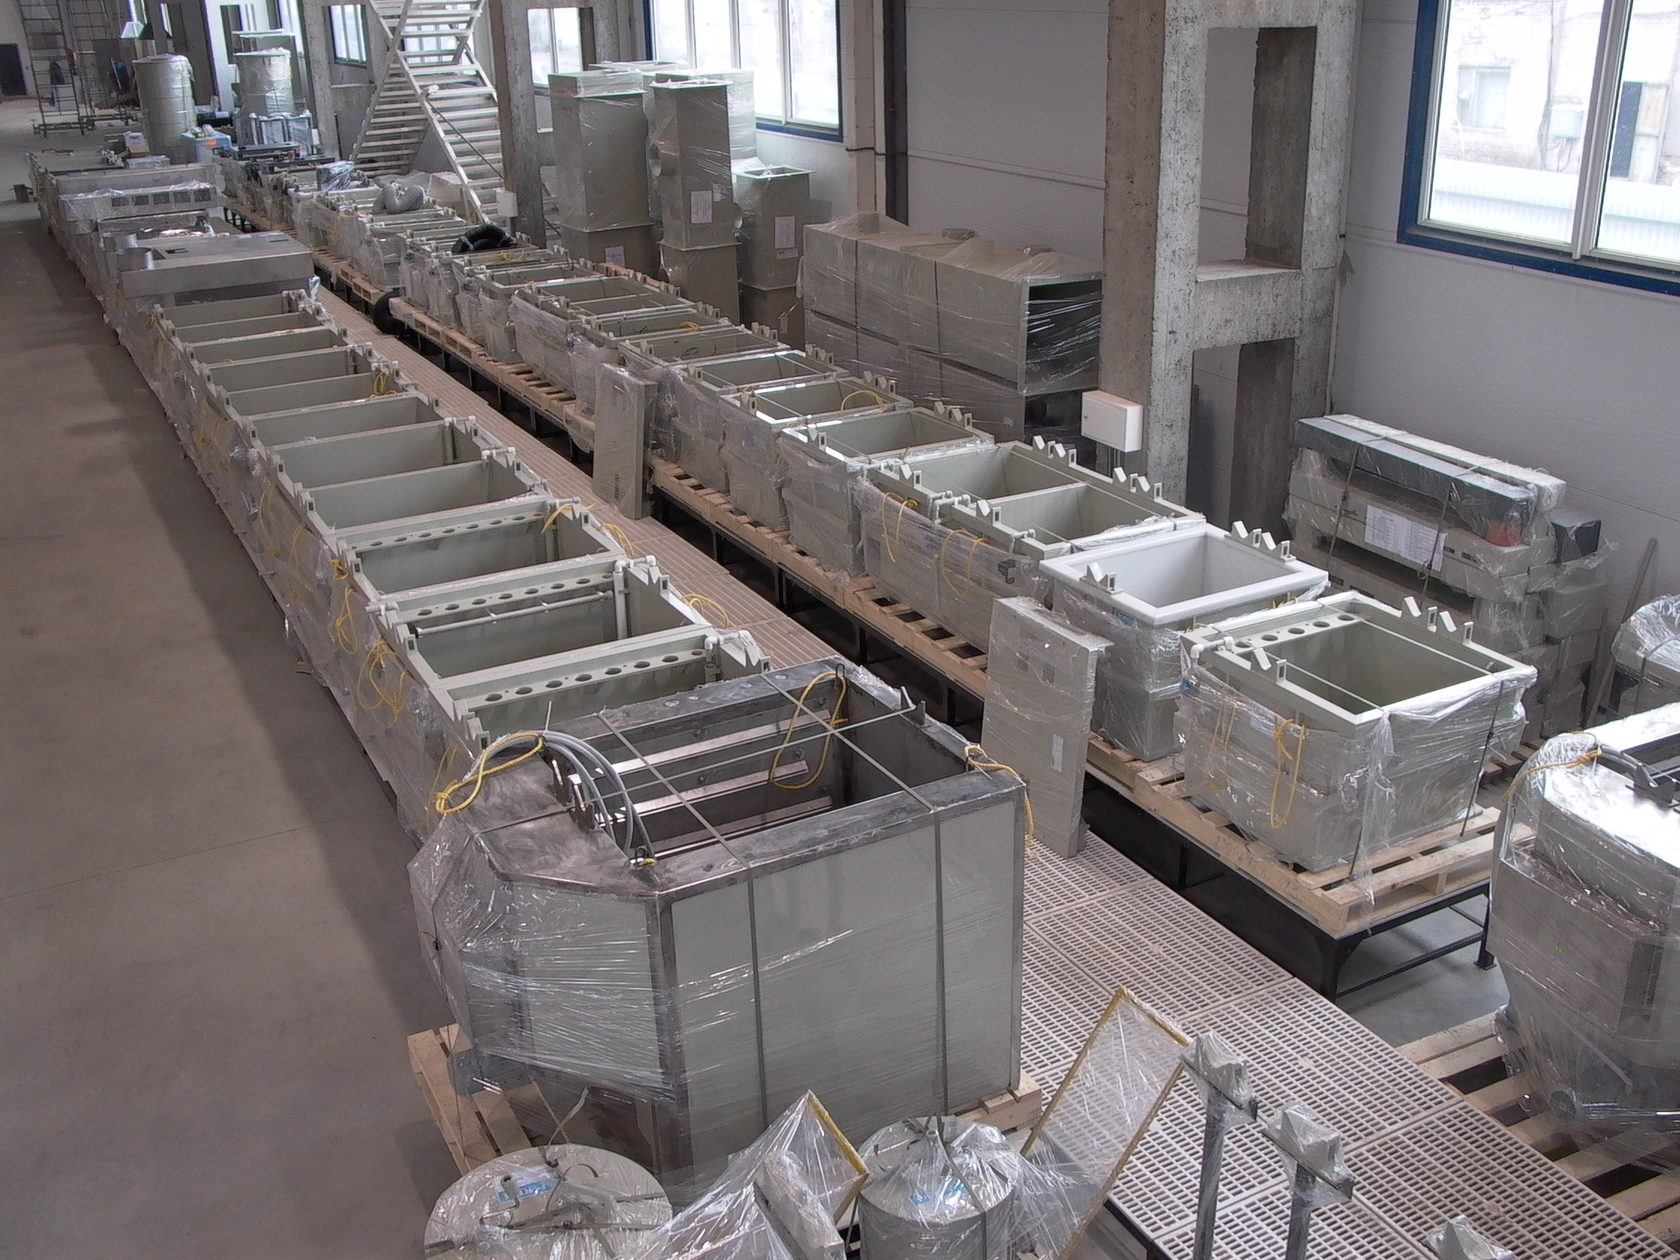 Electroplating baths